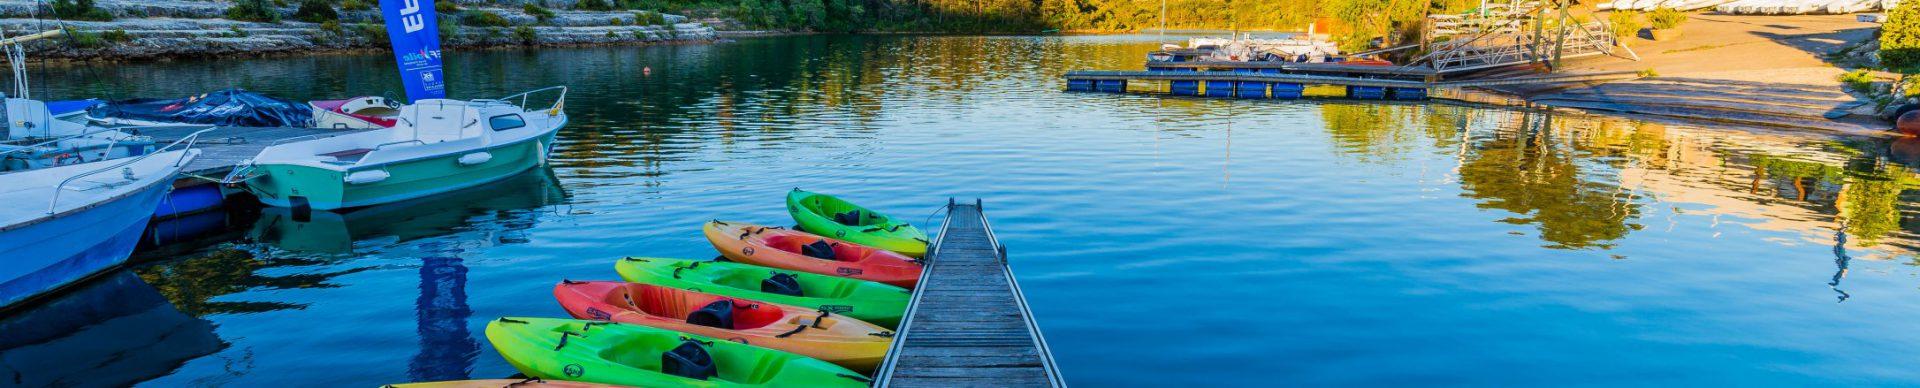 I laghi del Verdon : Il lago di Esparron-de-Verdon ©T. Verneuil